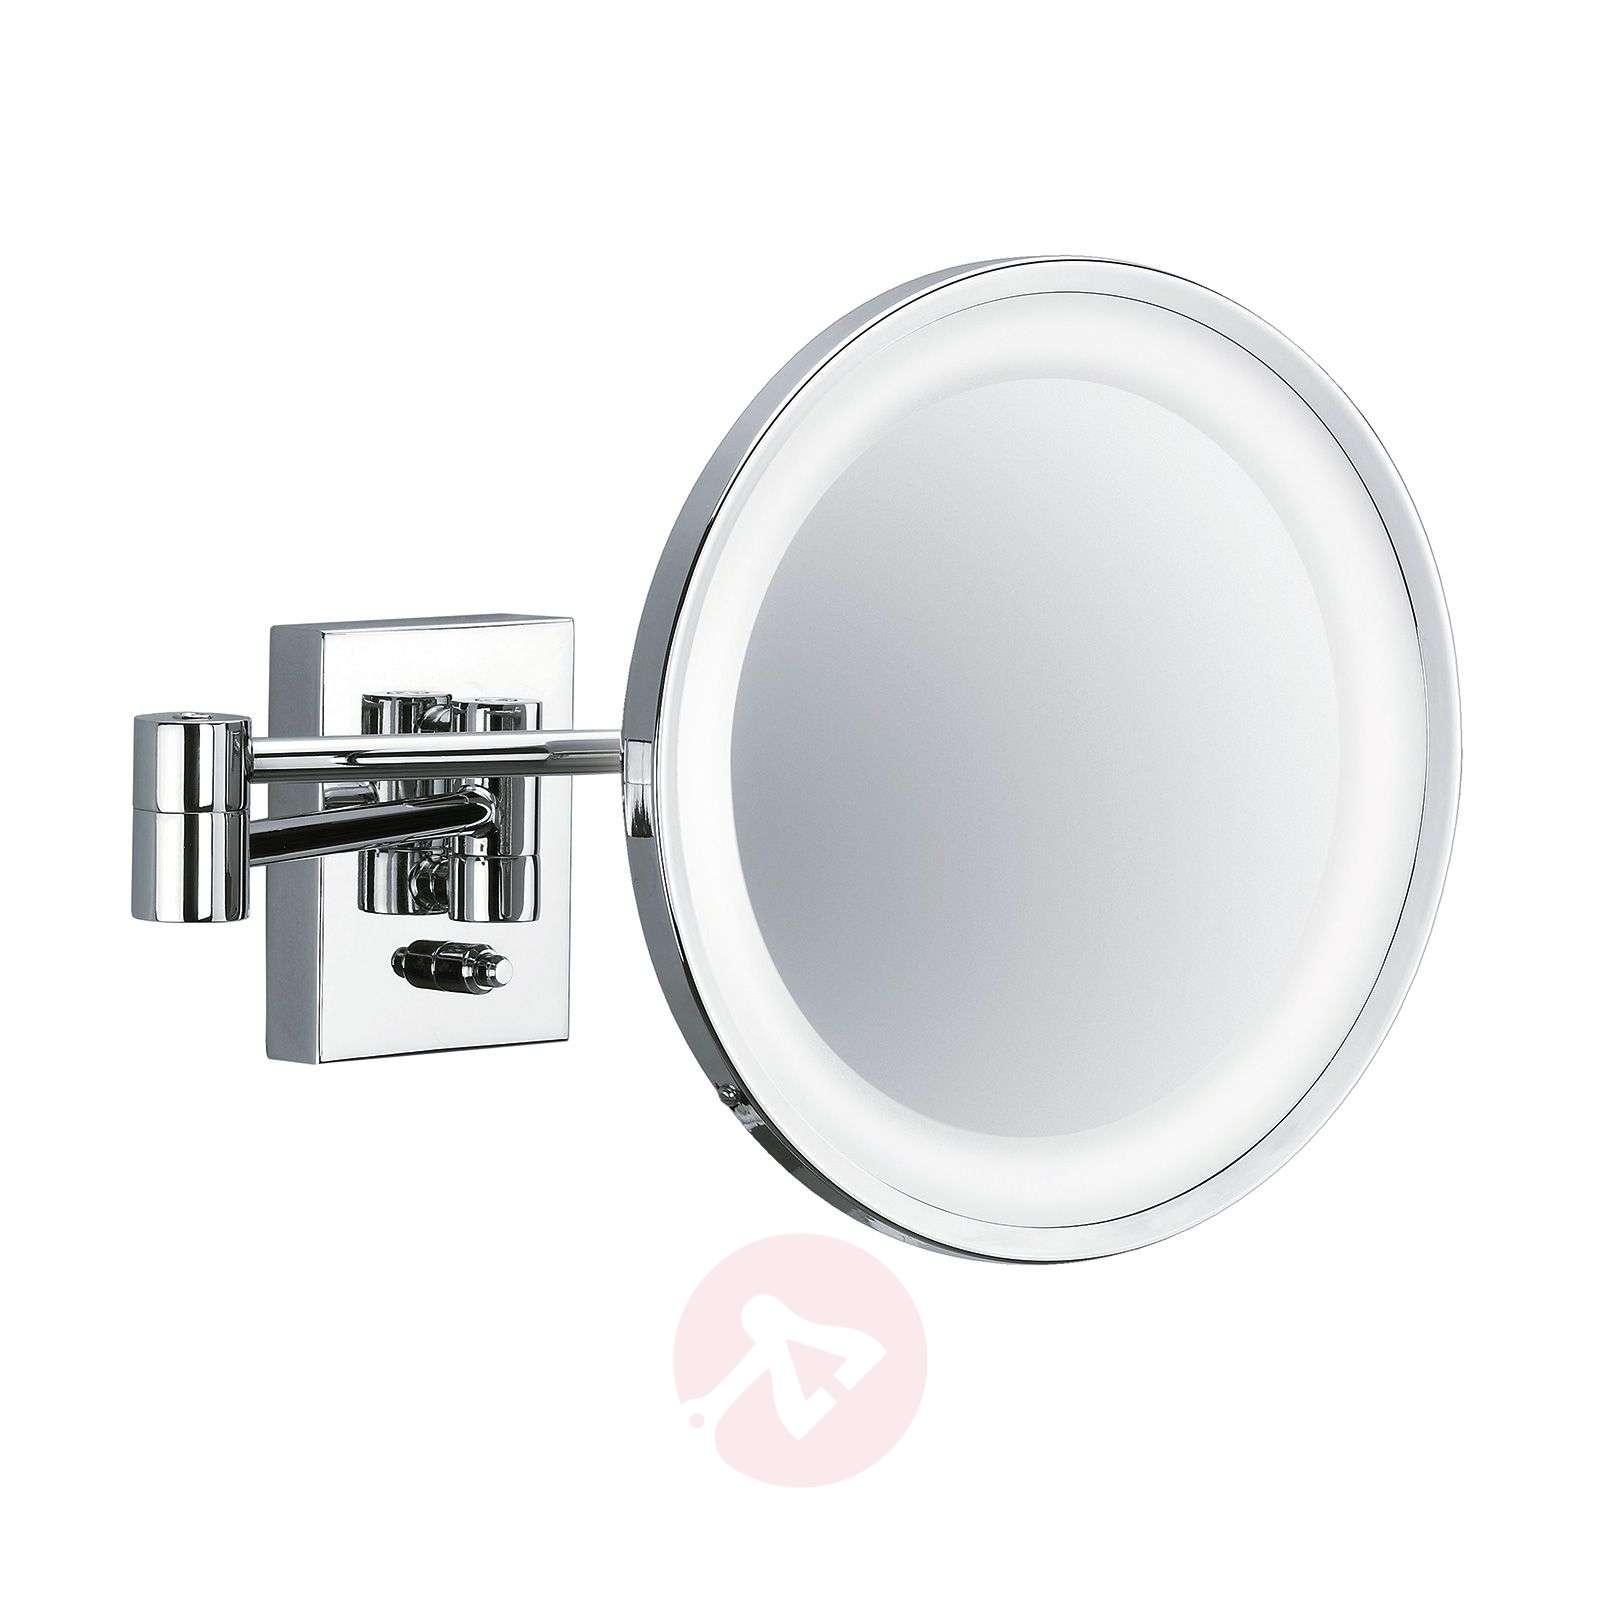 POINT illuminated cosmetic wall mirror, chrome-2504194-01